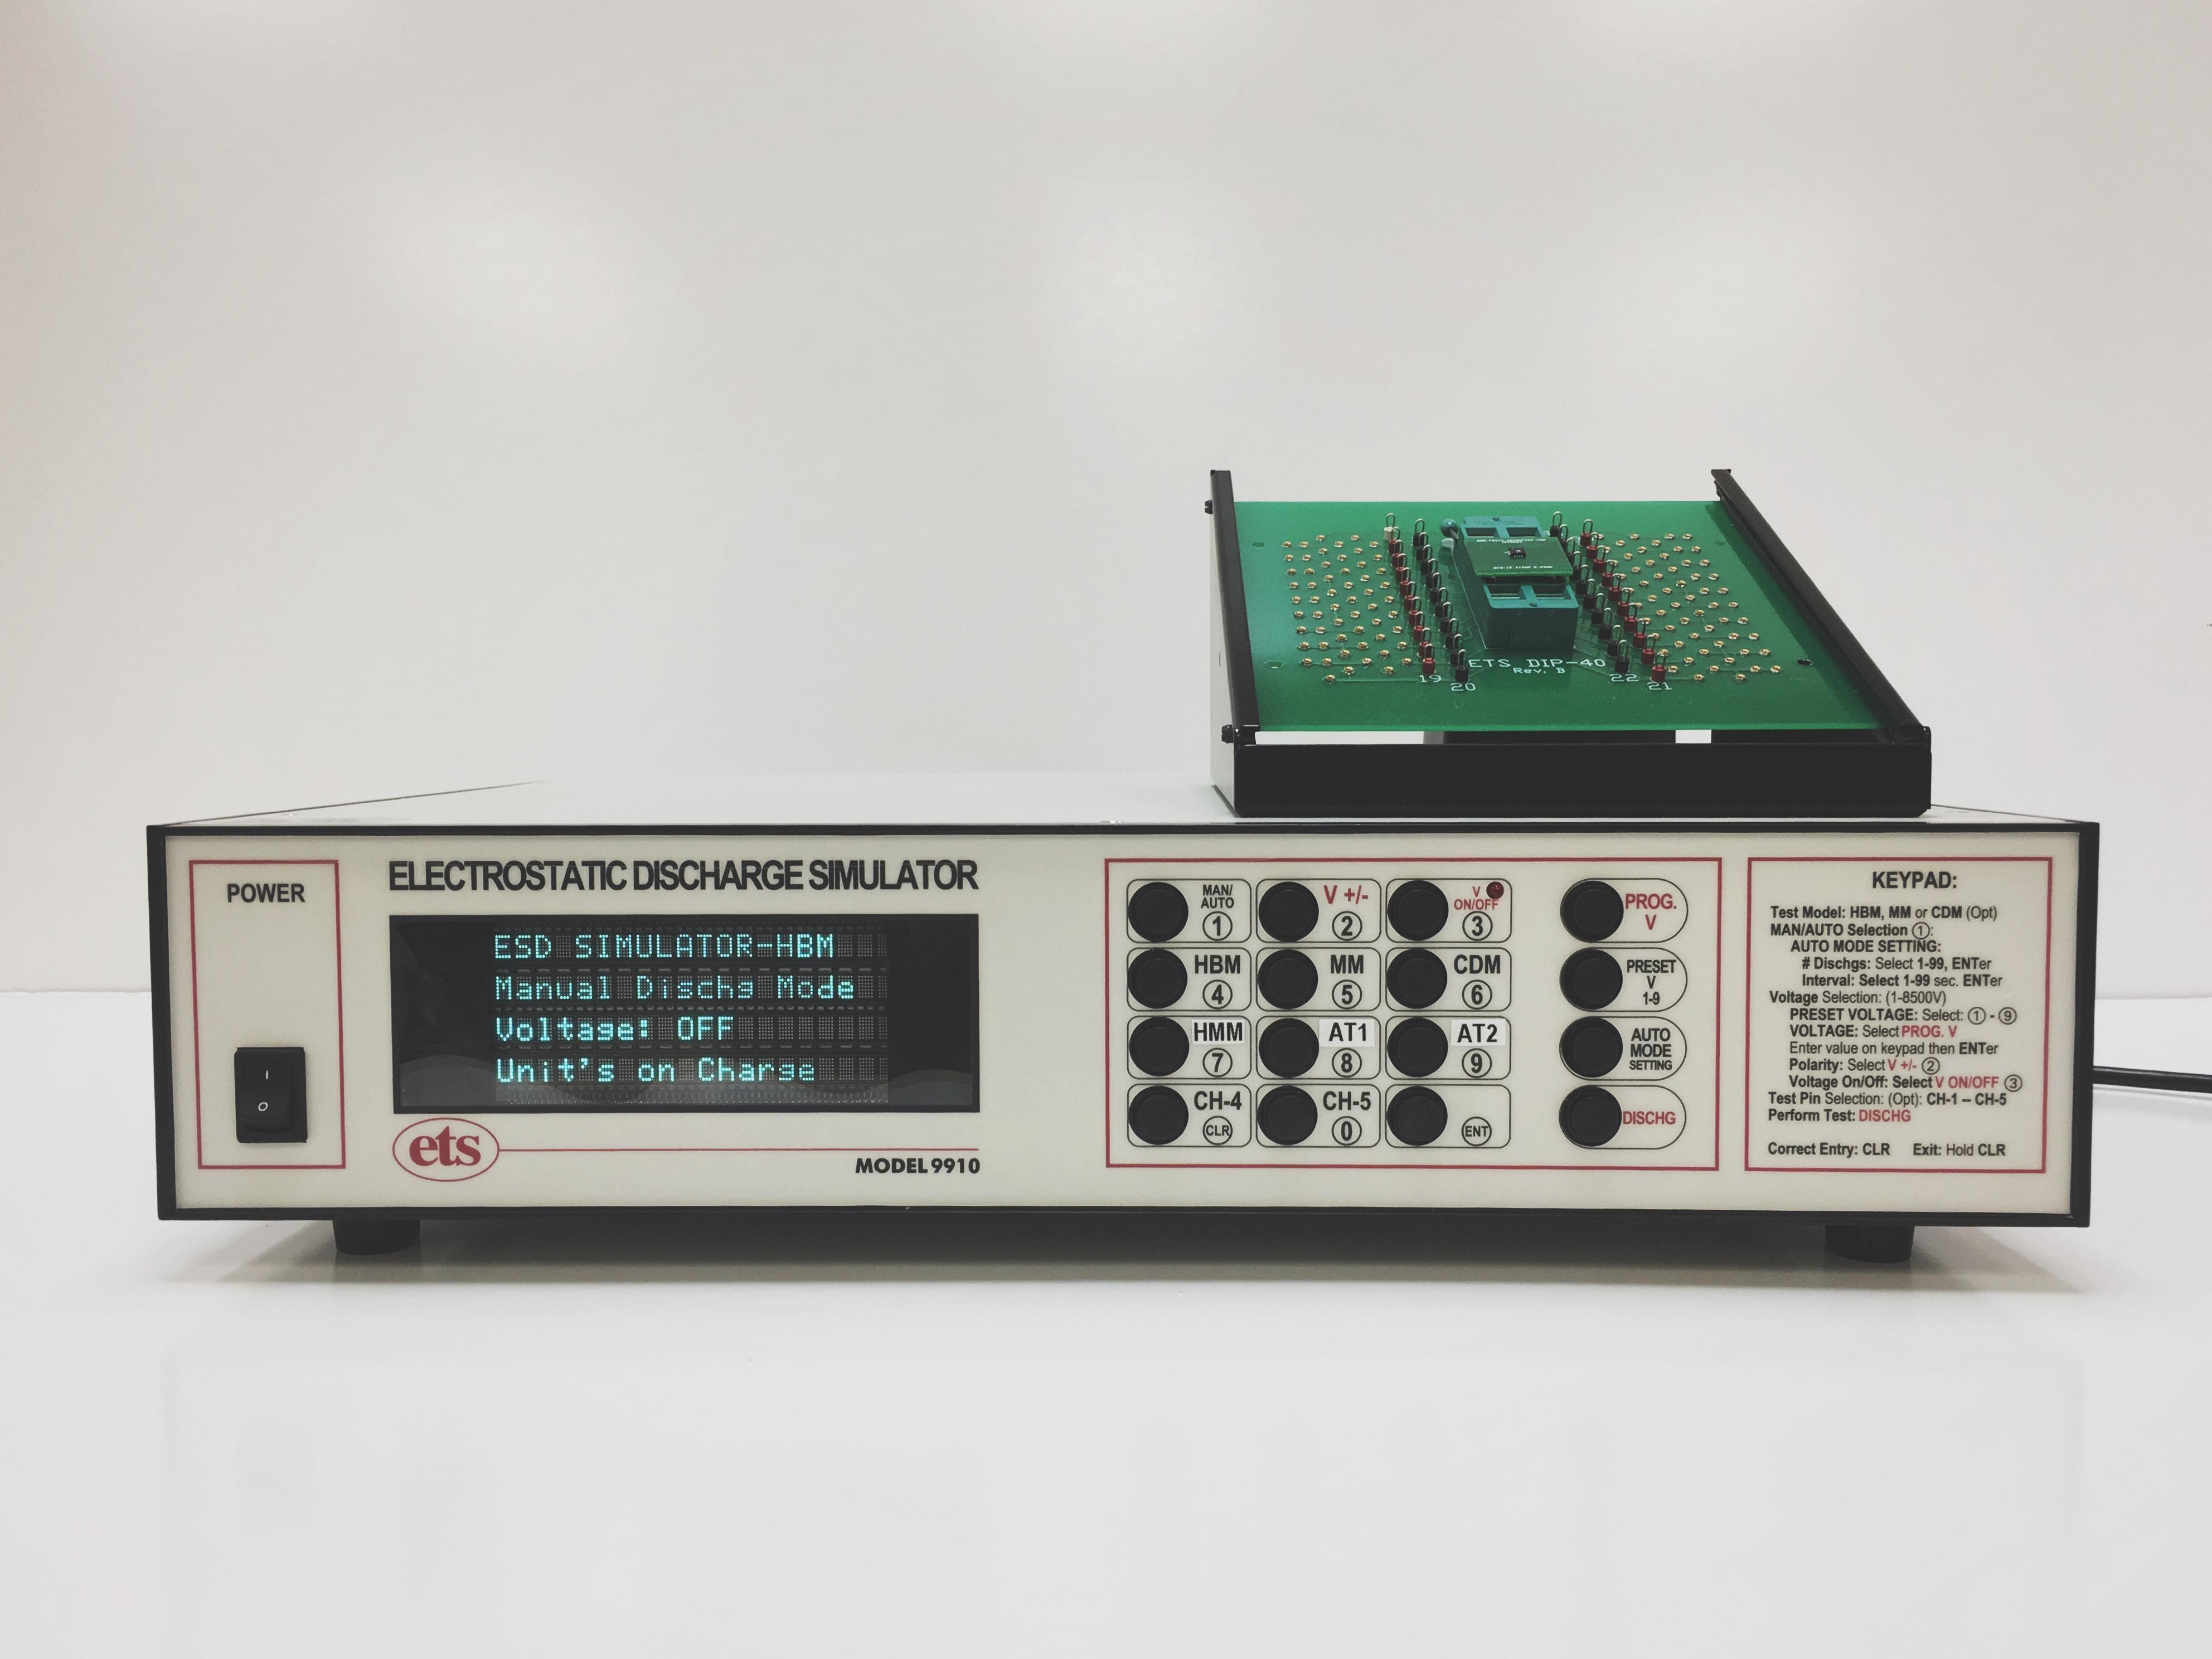 Model 9910 – ESD Simulator: HBM, MM, HMM, CDM